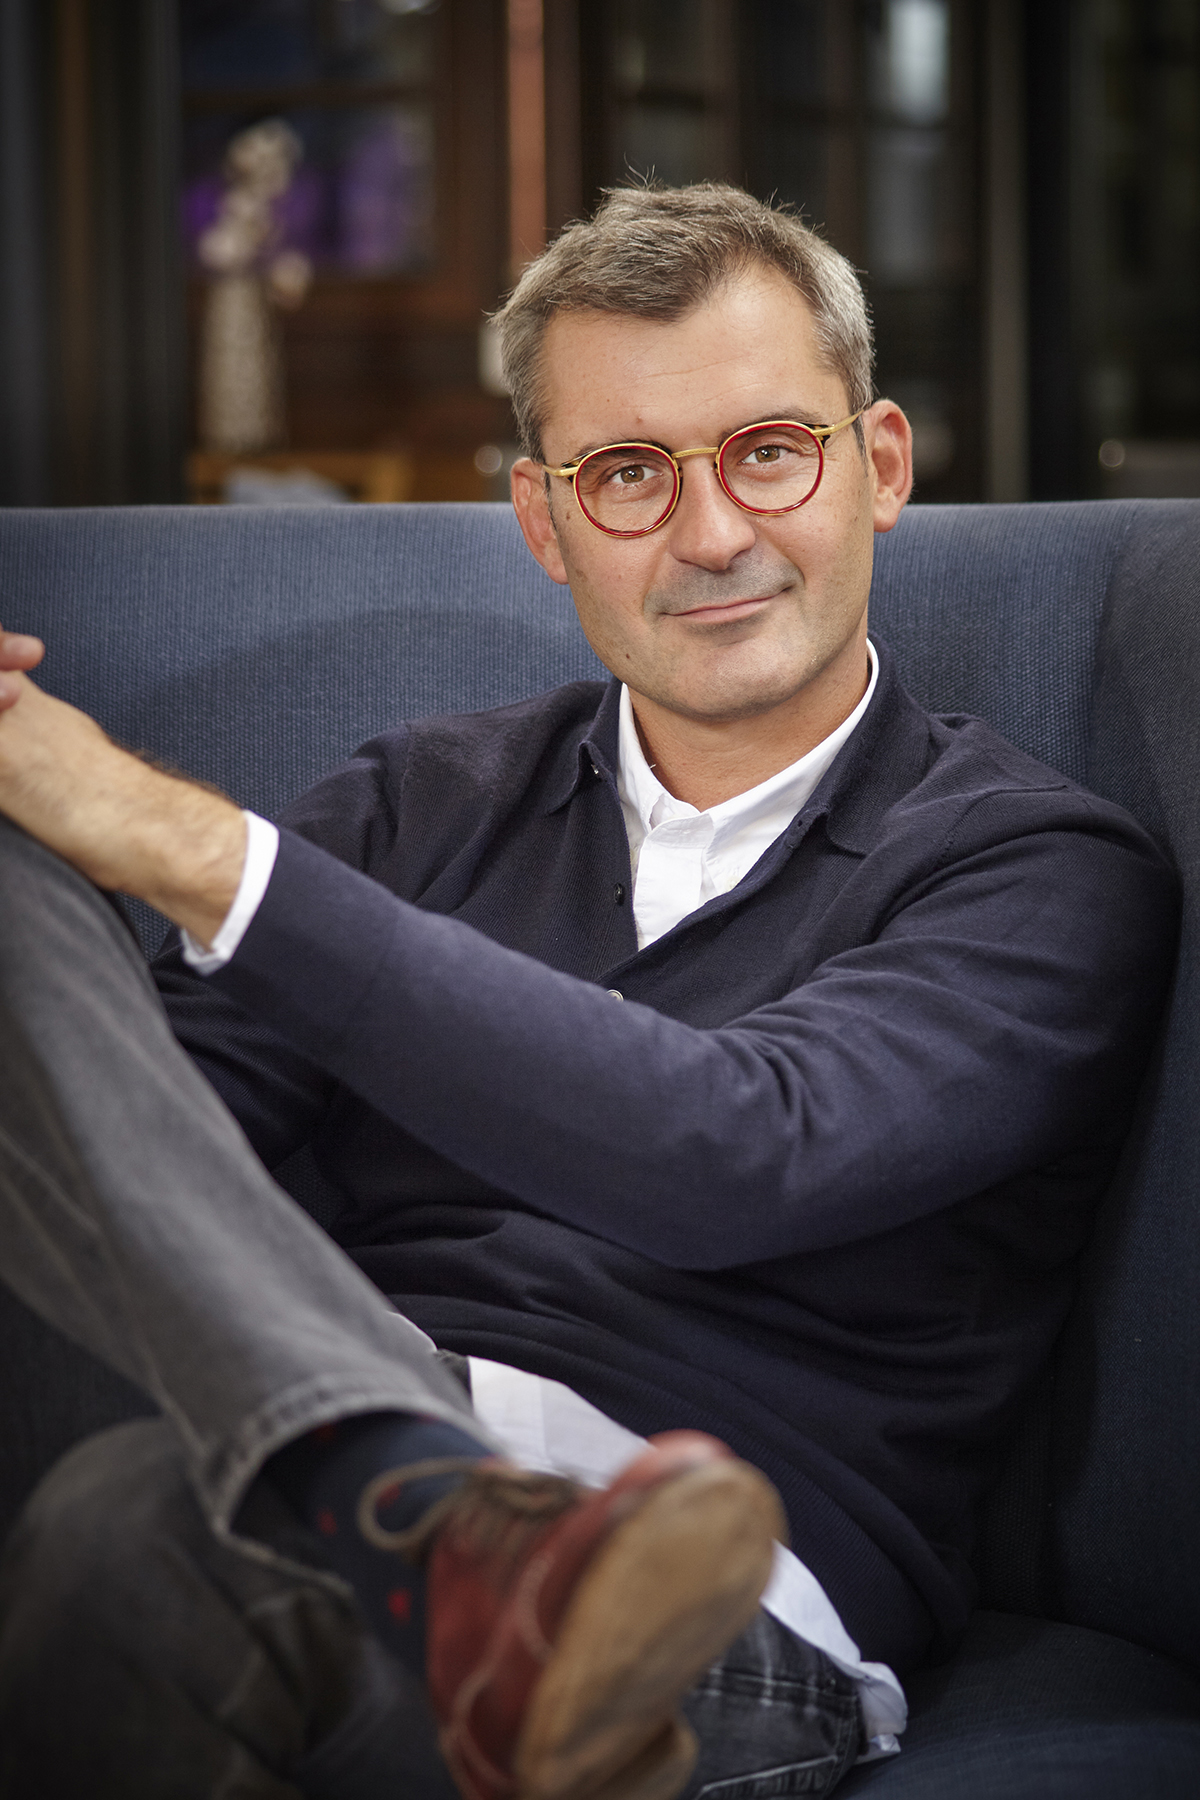 Etnia Barcelona offering financing plans for customers